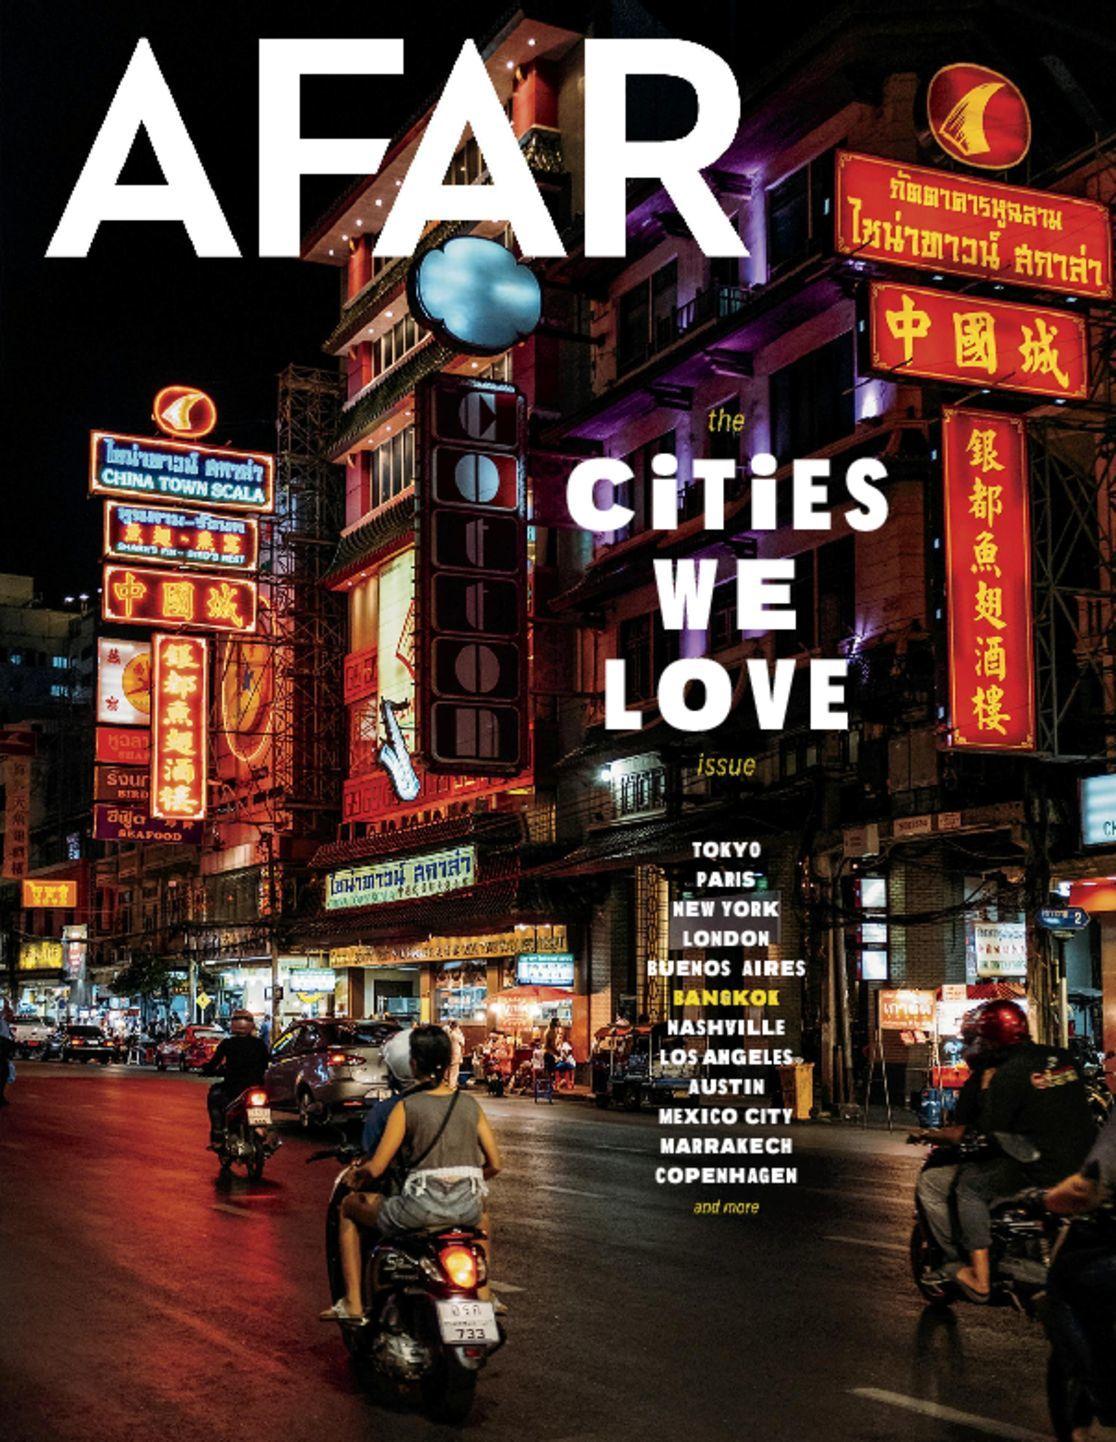 Afar Magazine Subscription